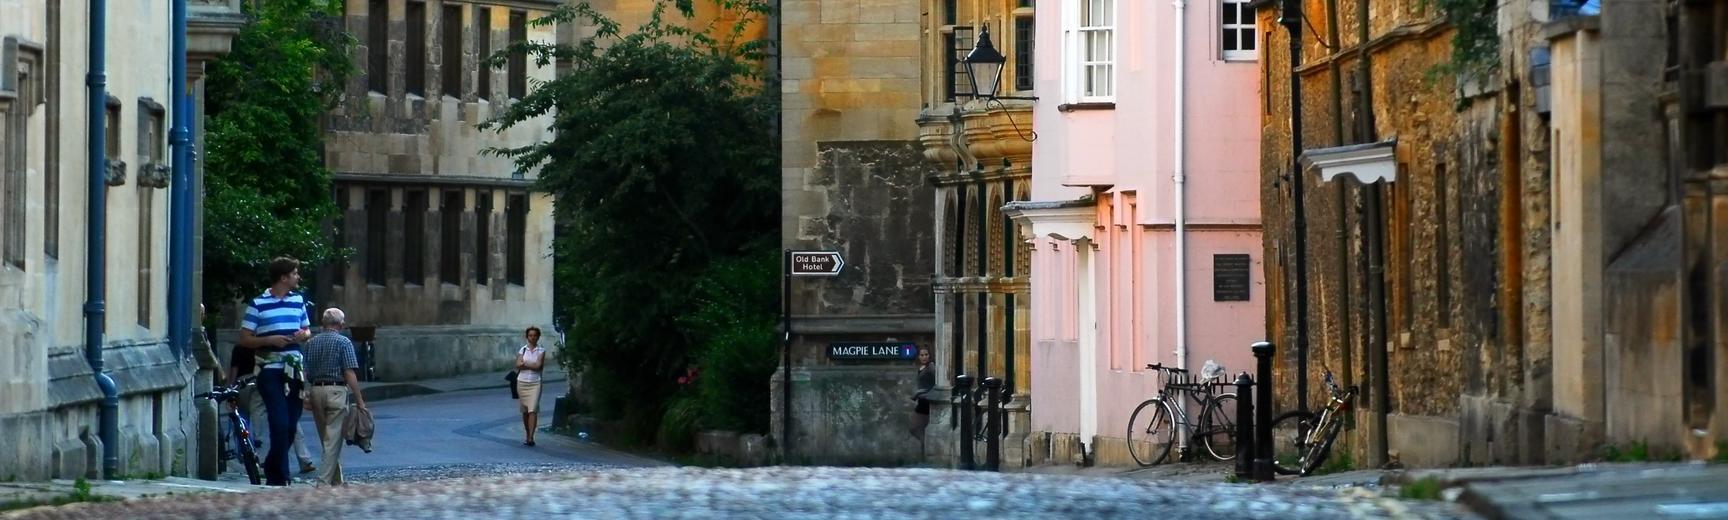 rd cobbled street narrow